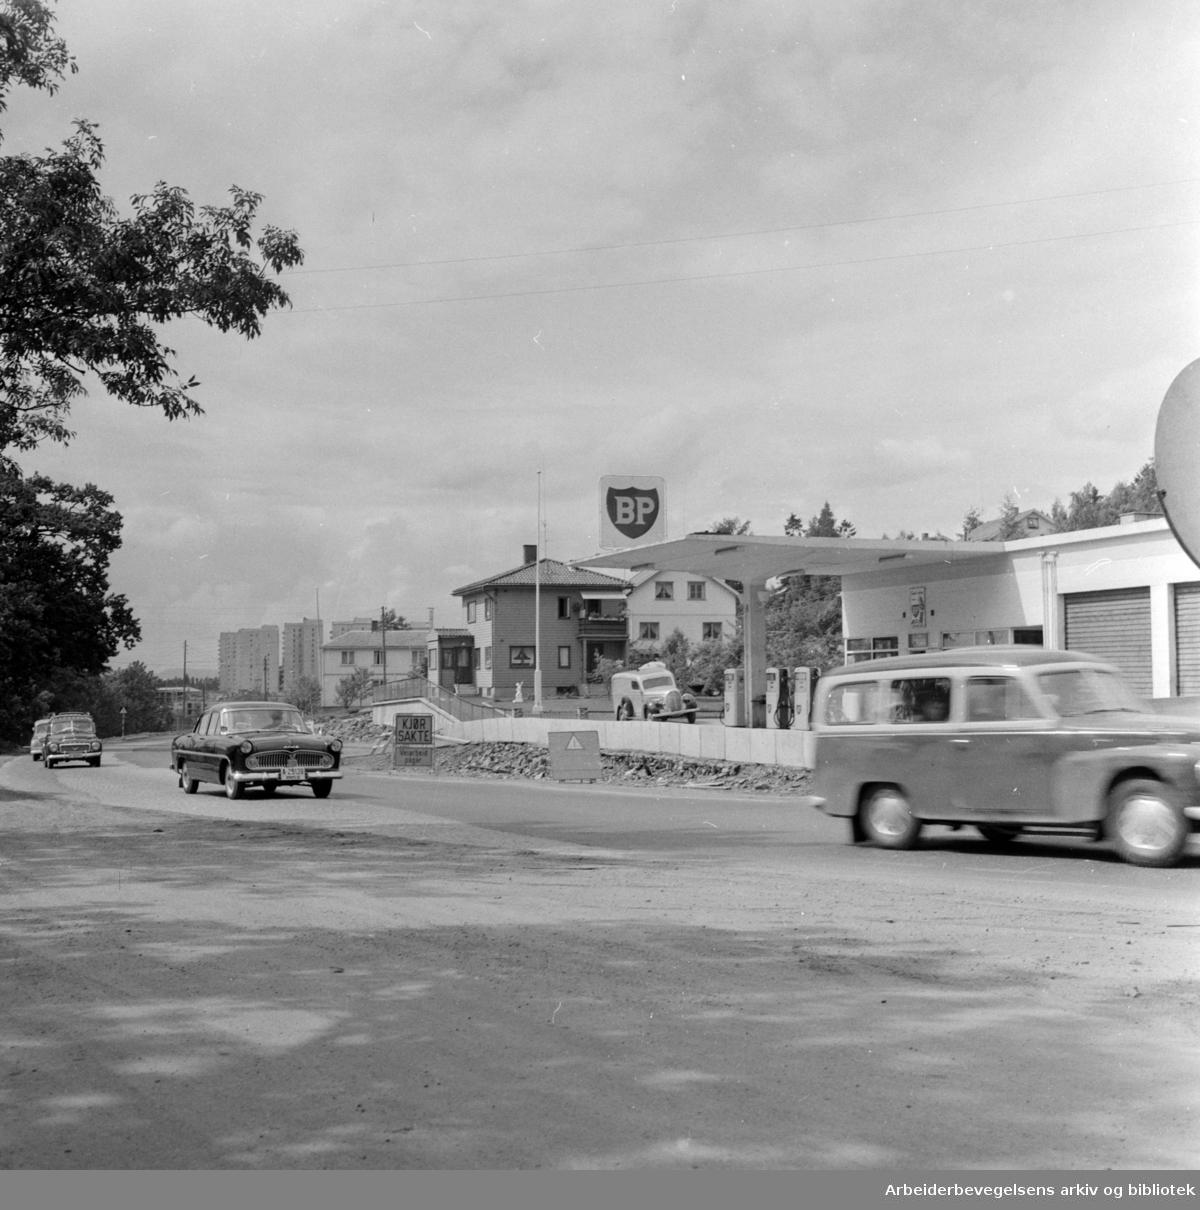 Trondheimsveien. Flaskehals ved Lunden stoppested. Juli 1961